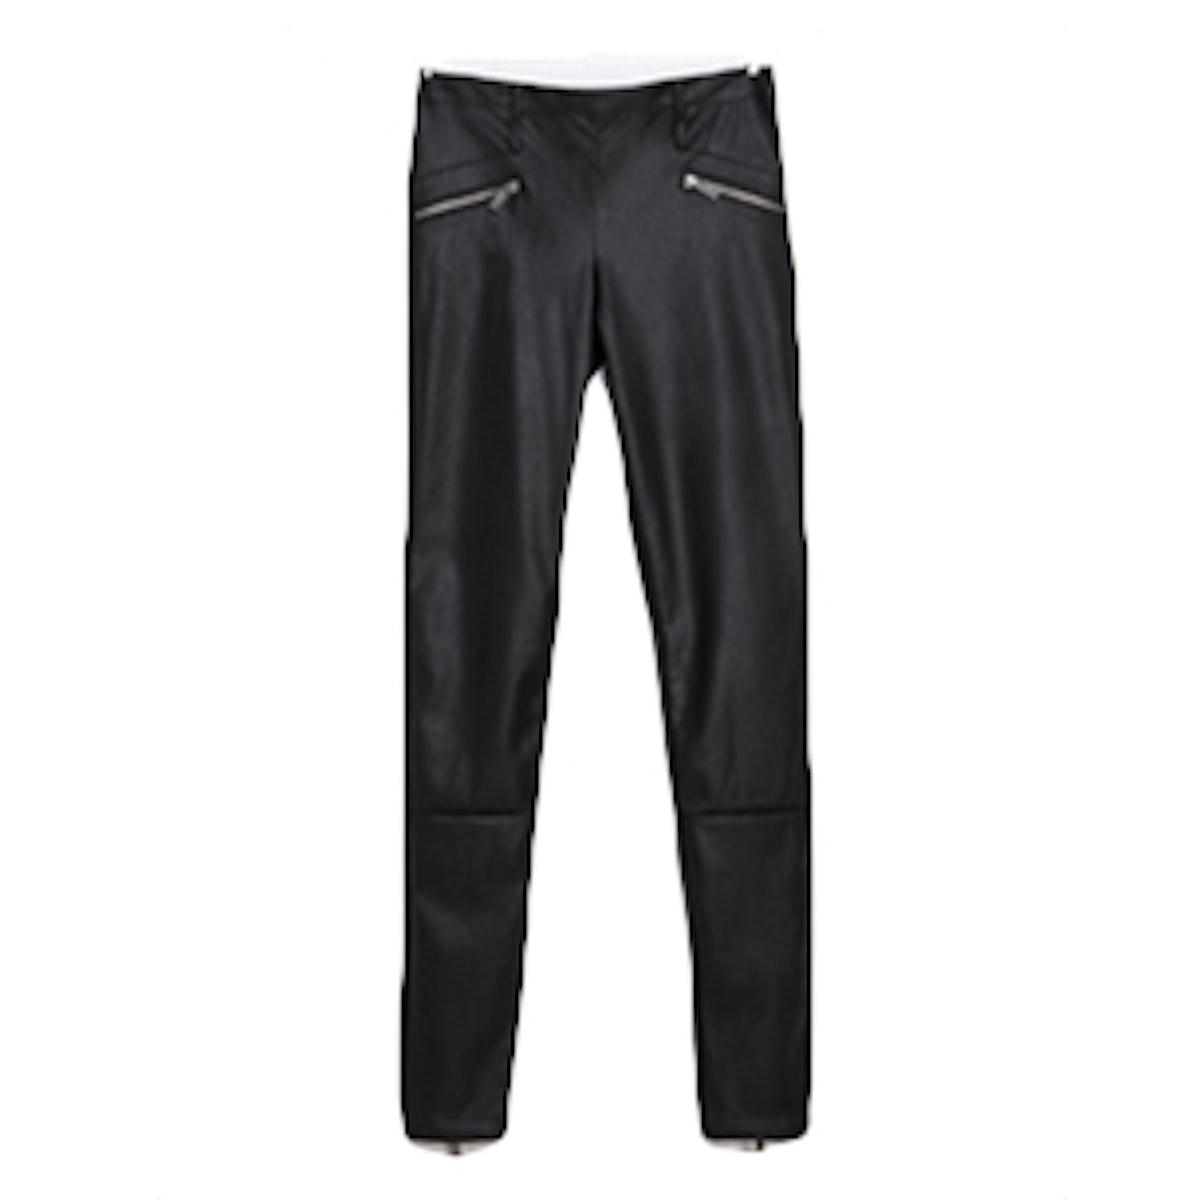 Leather Leggings With Zips